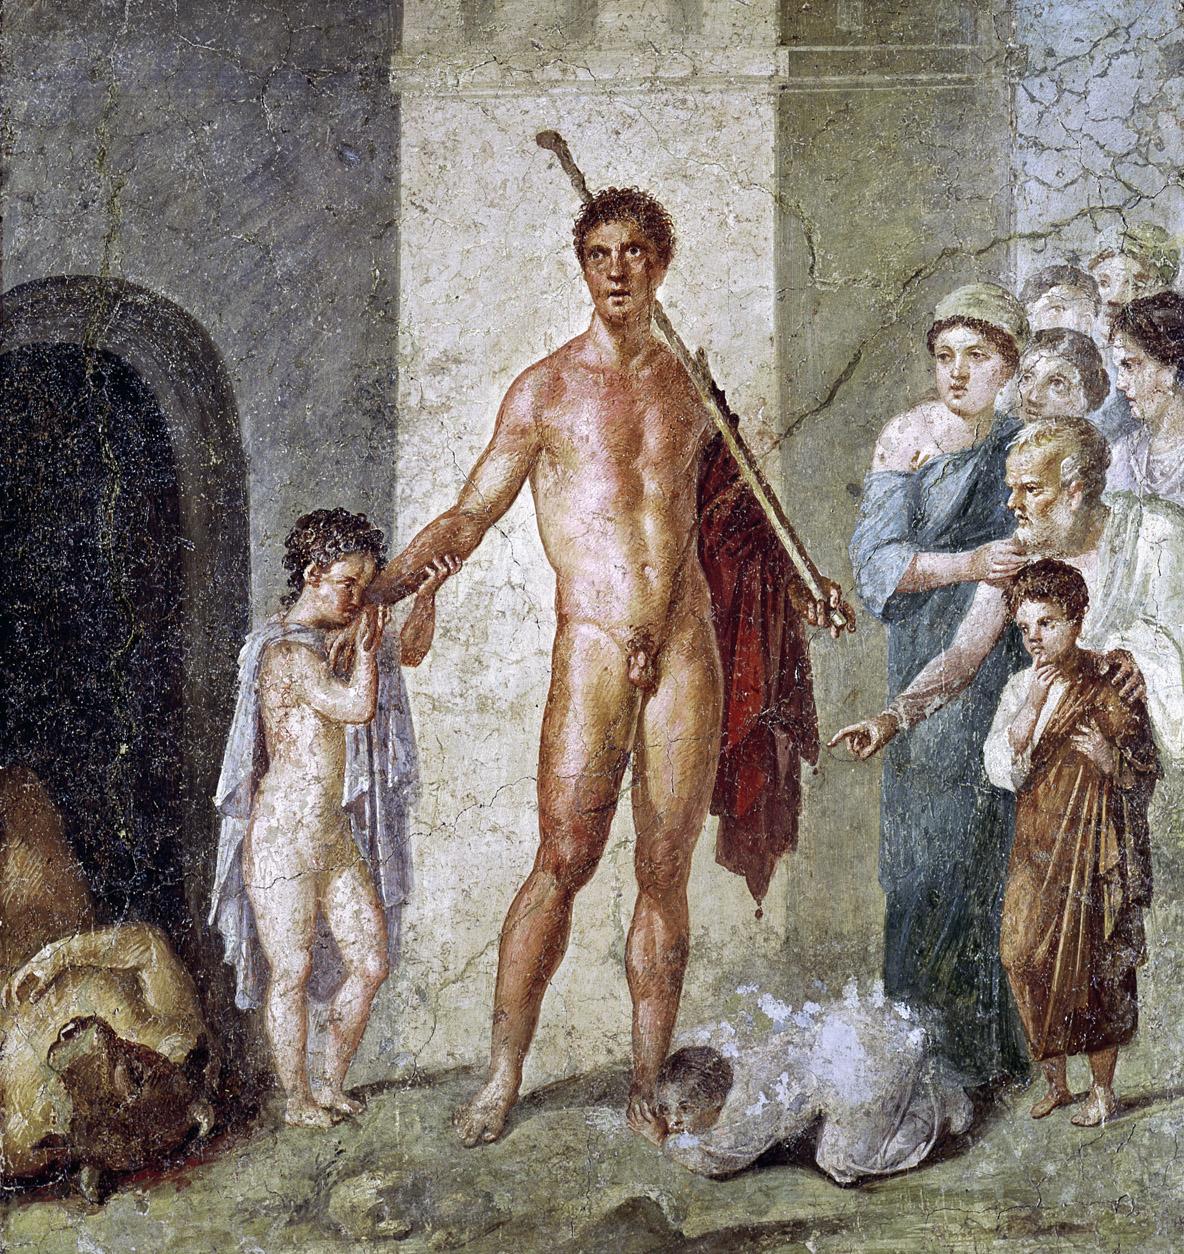 Theseus triumphs over the Minotaur, fresco, Pompeii, c. 70. Naples National Archaeological Museum, Italy.